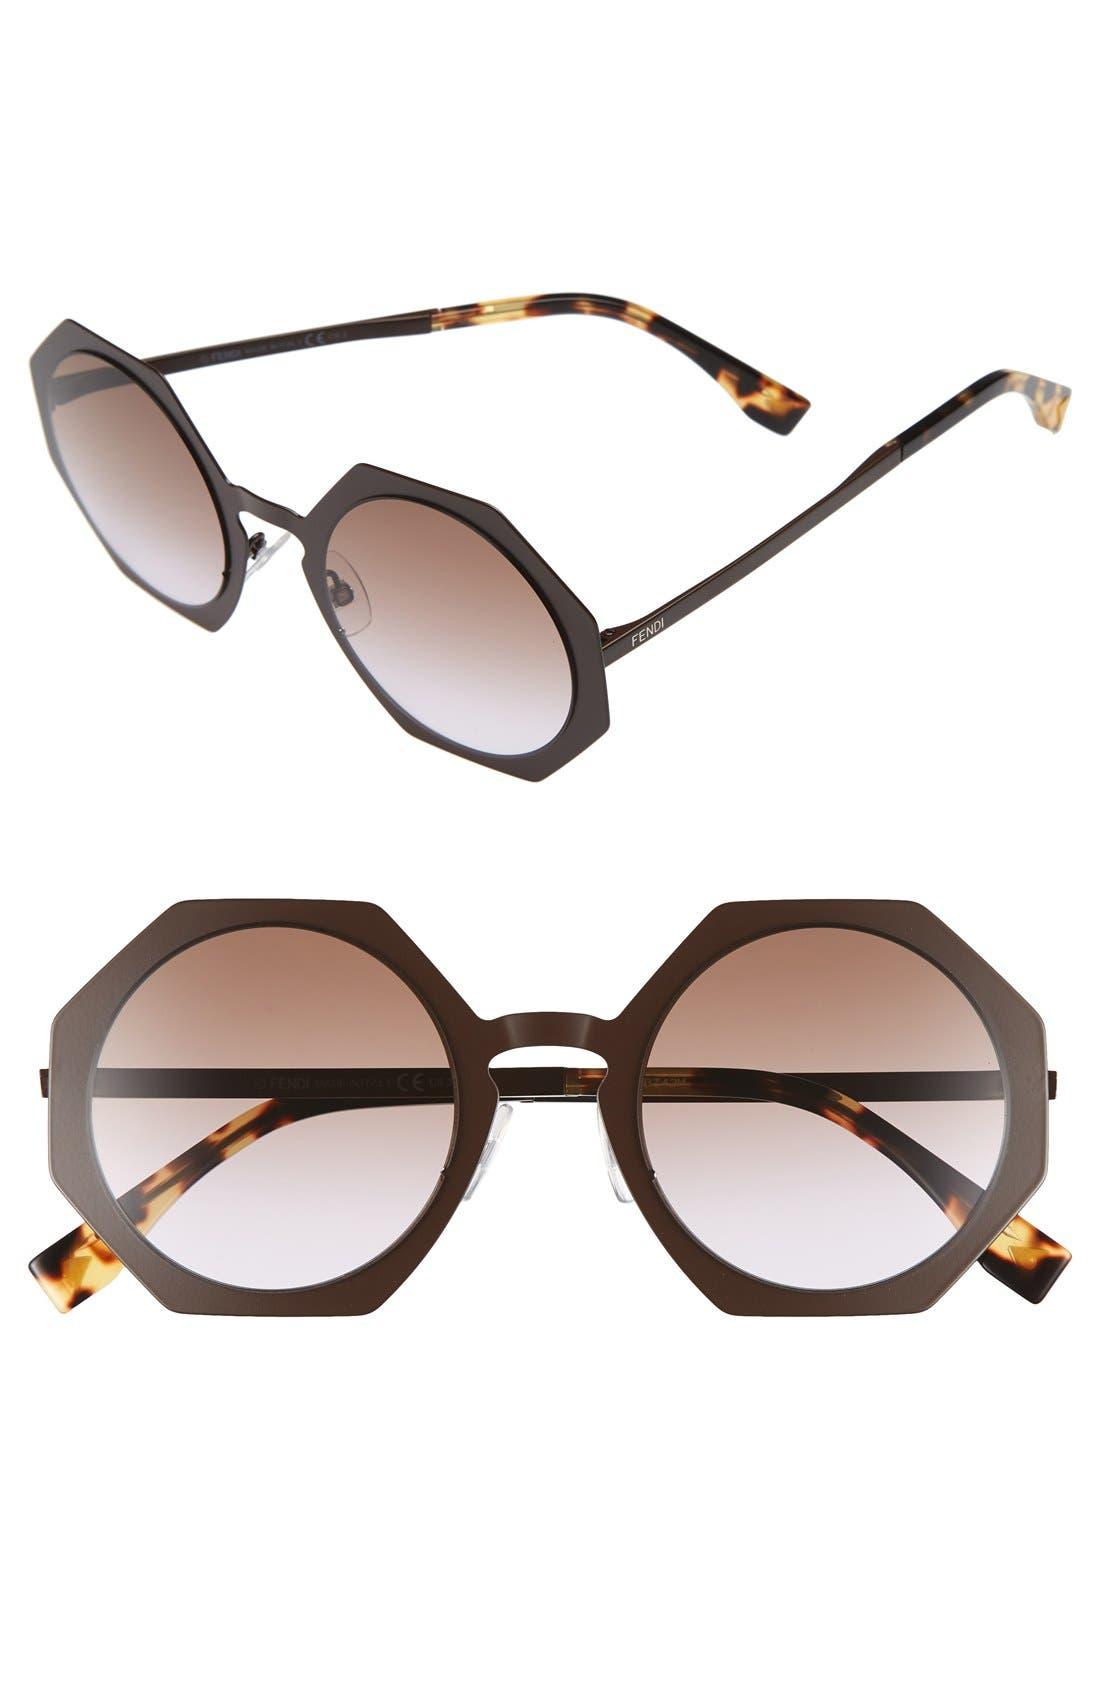 51mm Retro Octagon Sunglasses,                         Main,                         color,